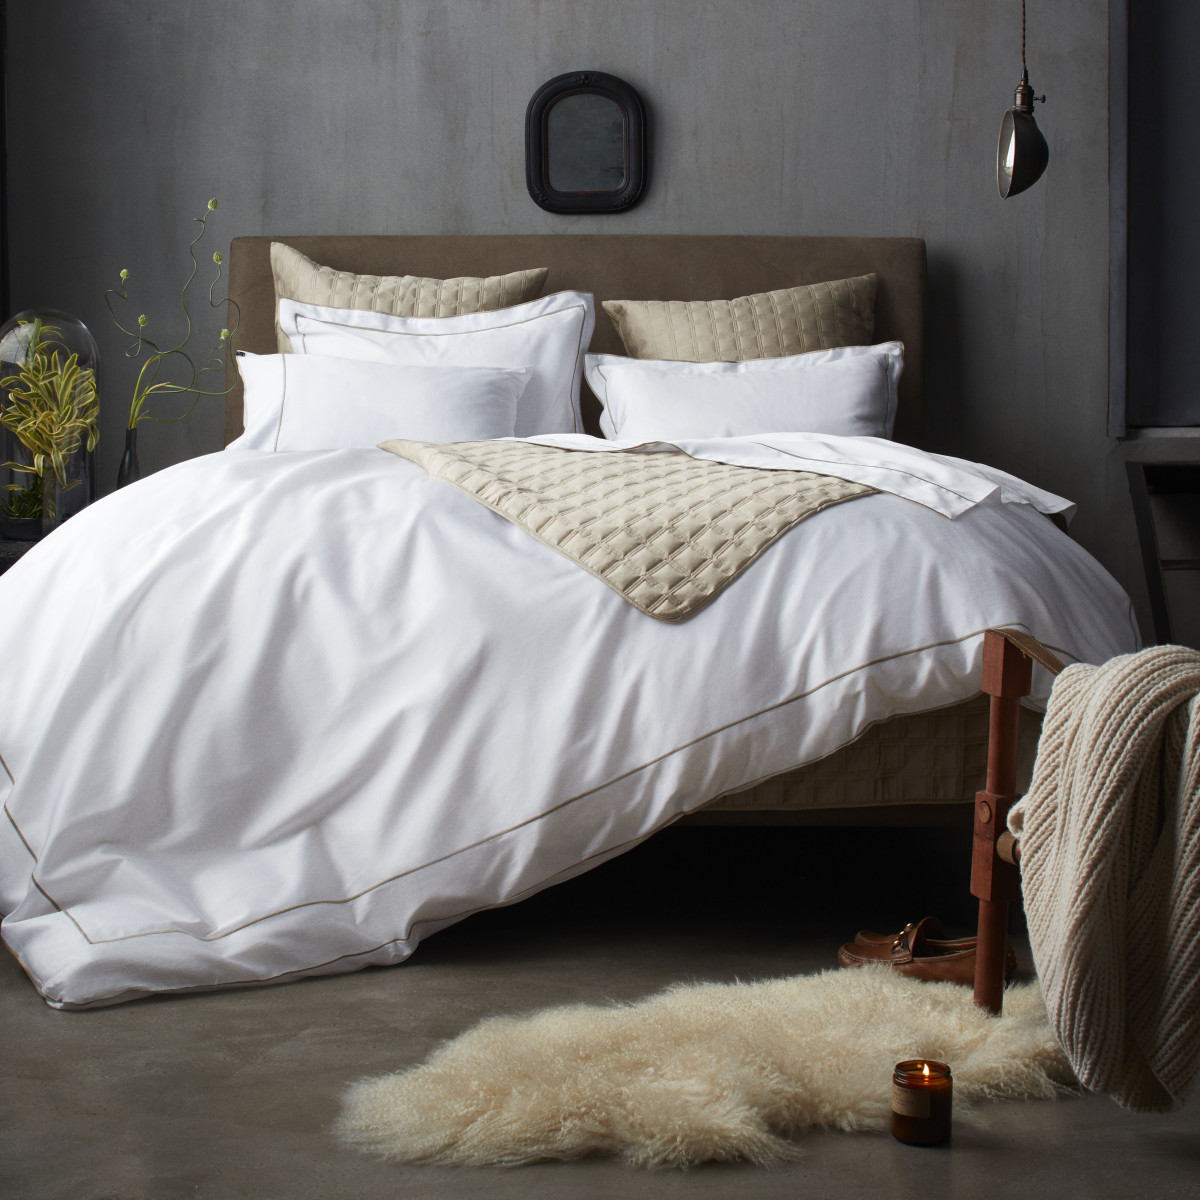 10 Grove bedding Irving